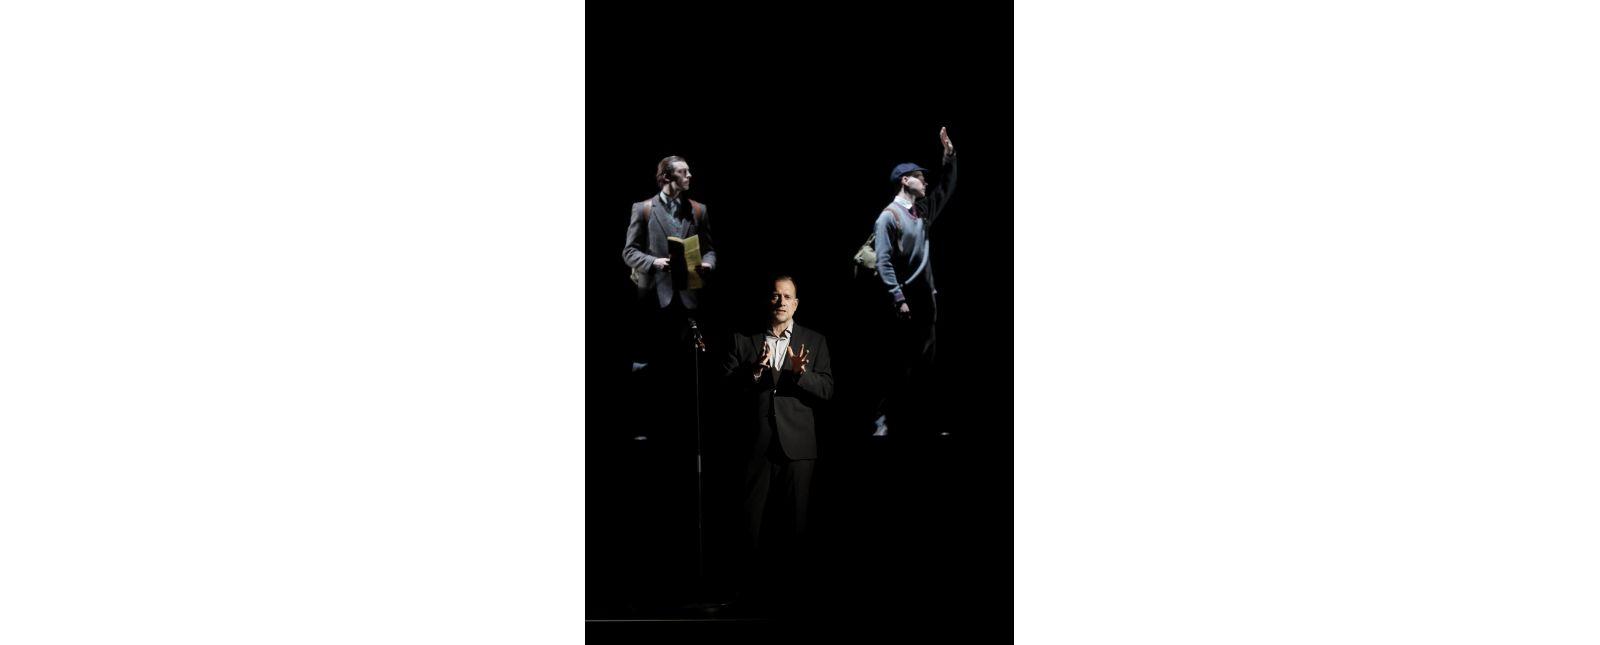 SCHAUINSLAND - The Misfortune of the English // Fabian Gerhardt / Statisterie des Theater Freiburg // Foto: Paul Leclaire